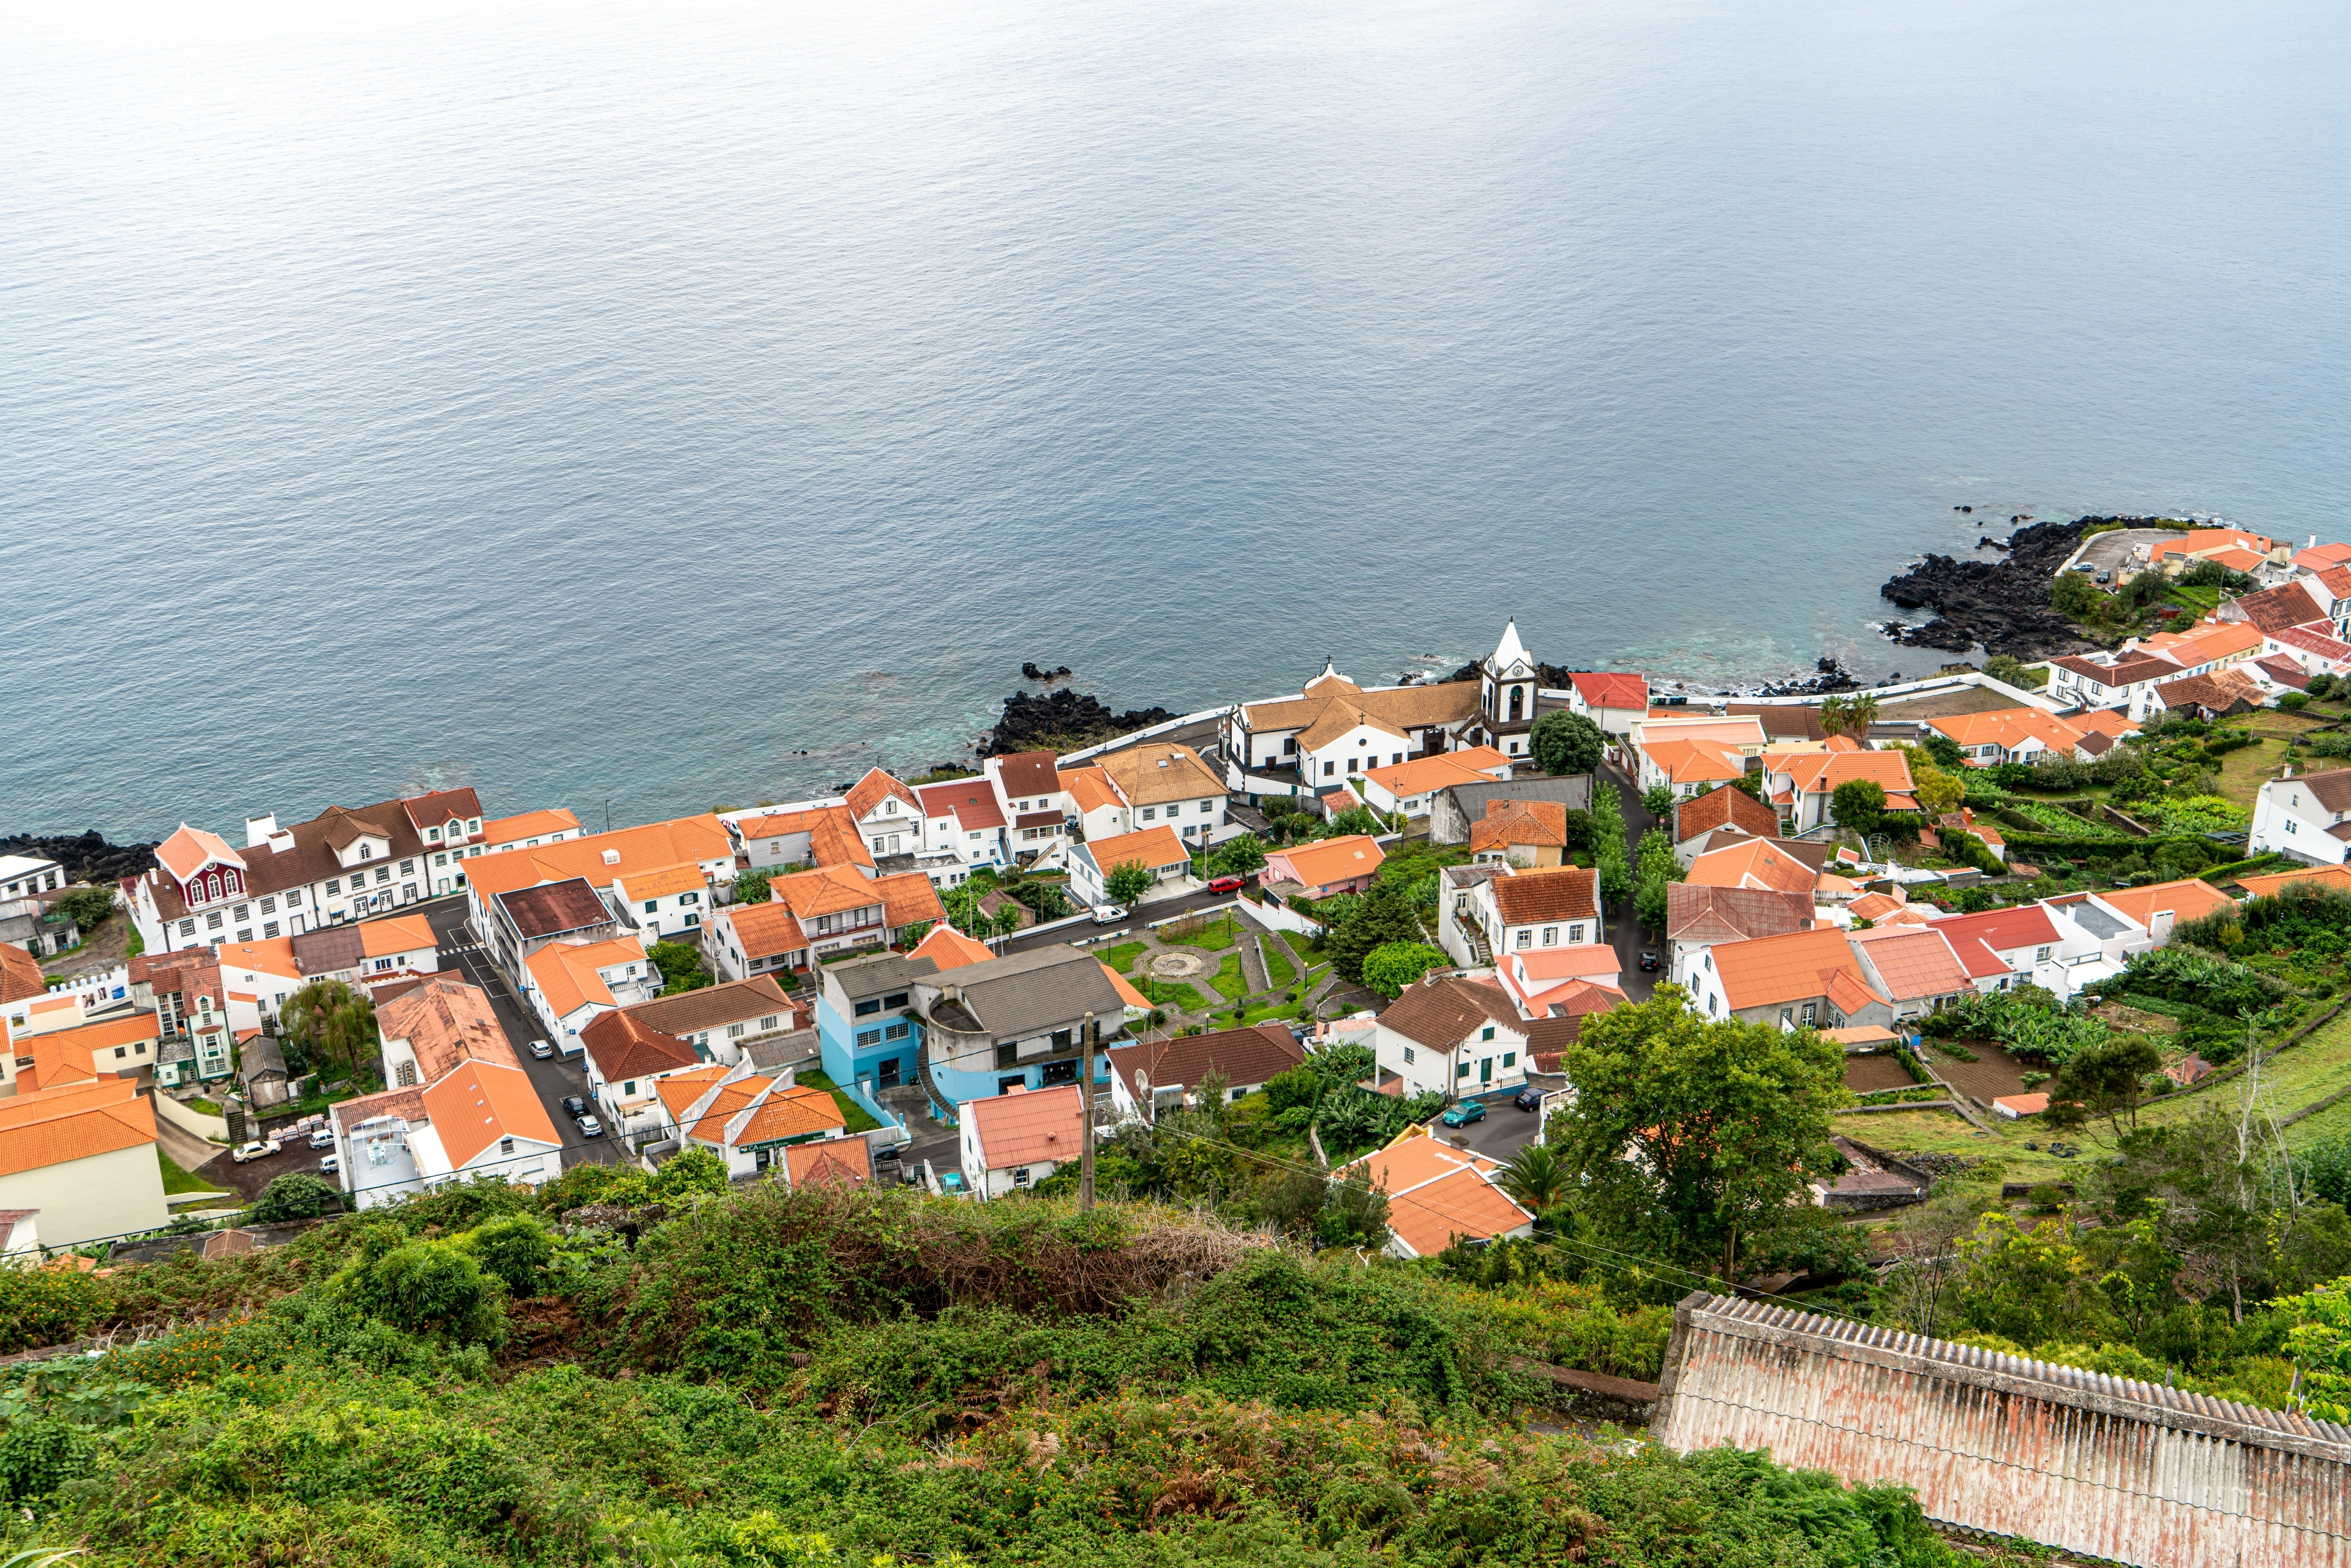 Sao Jorge (Insel), Portugal